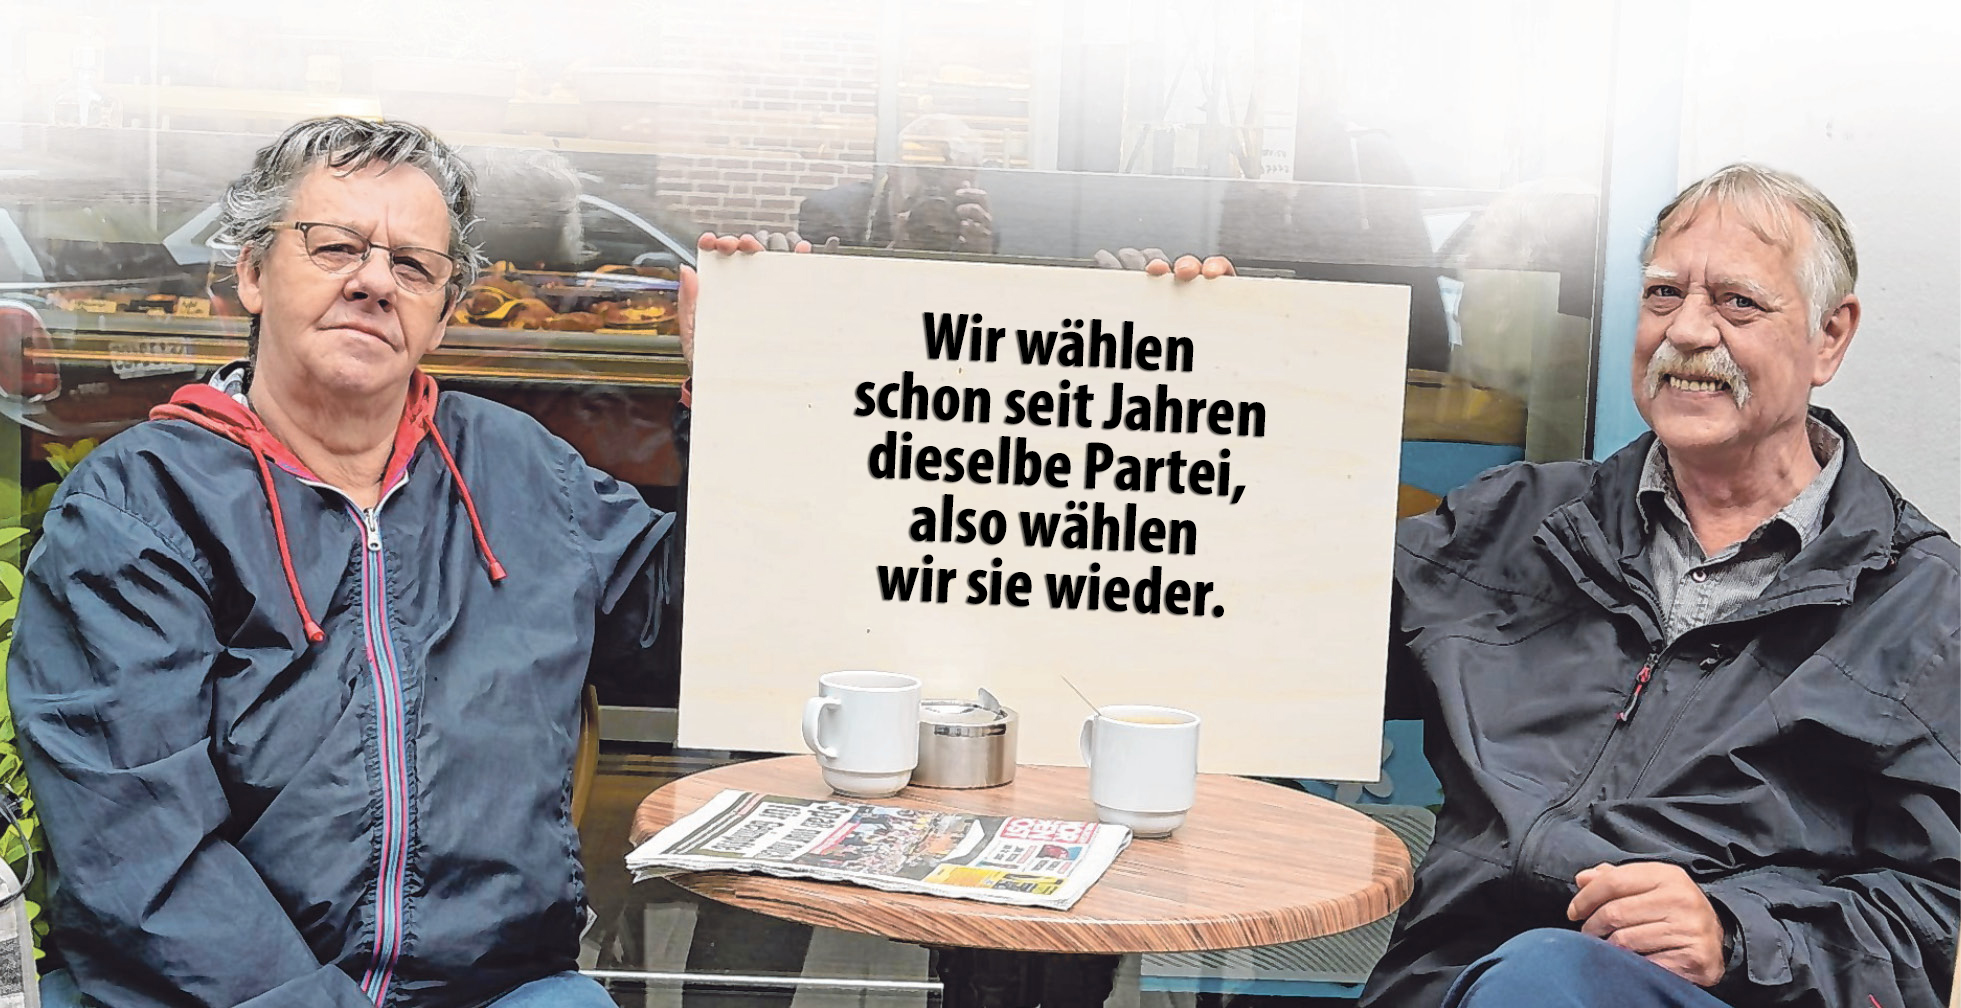 Das Rentner-Ehepaar Bärbel (72) und Bernd (67) Köhnke aus Barmbek-Süd.